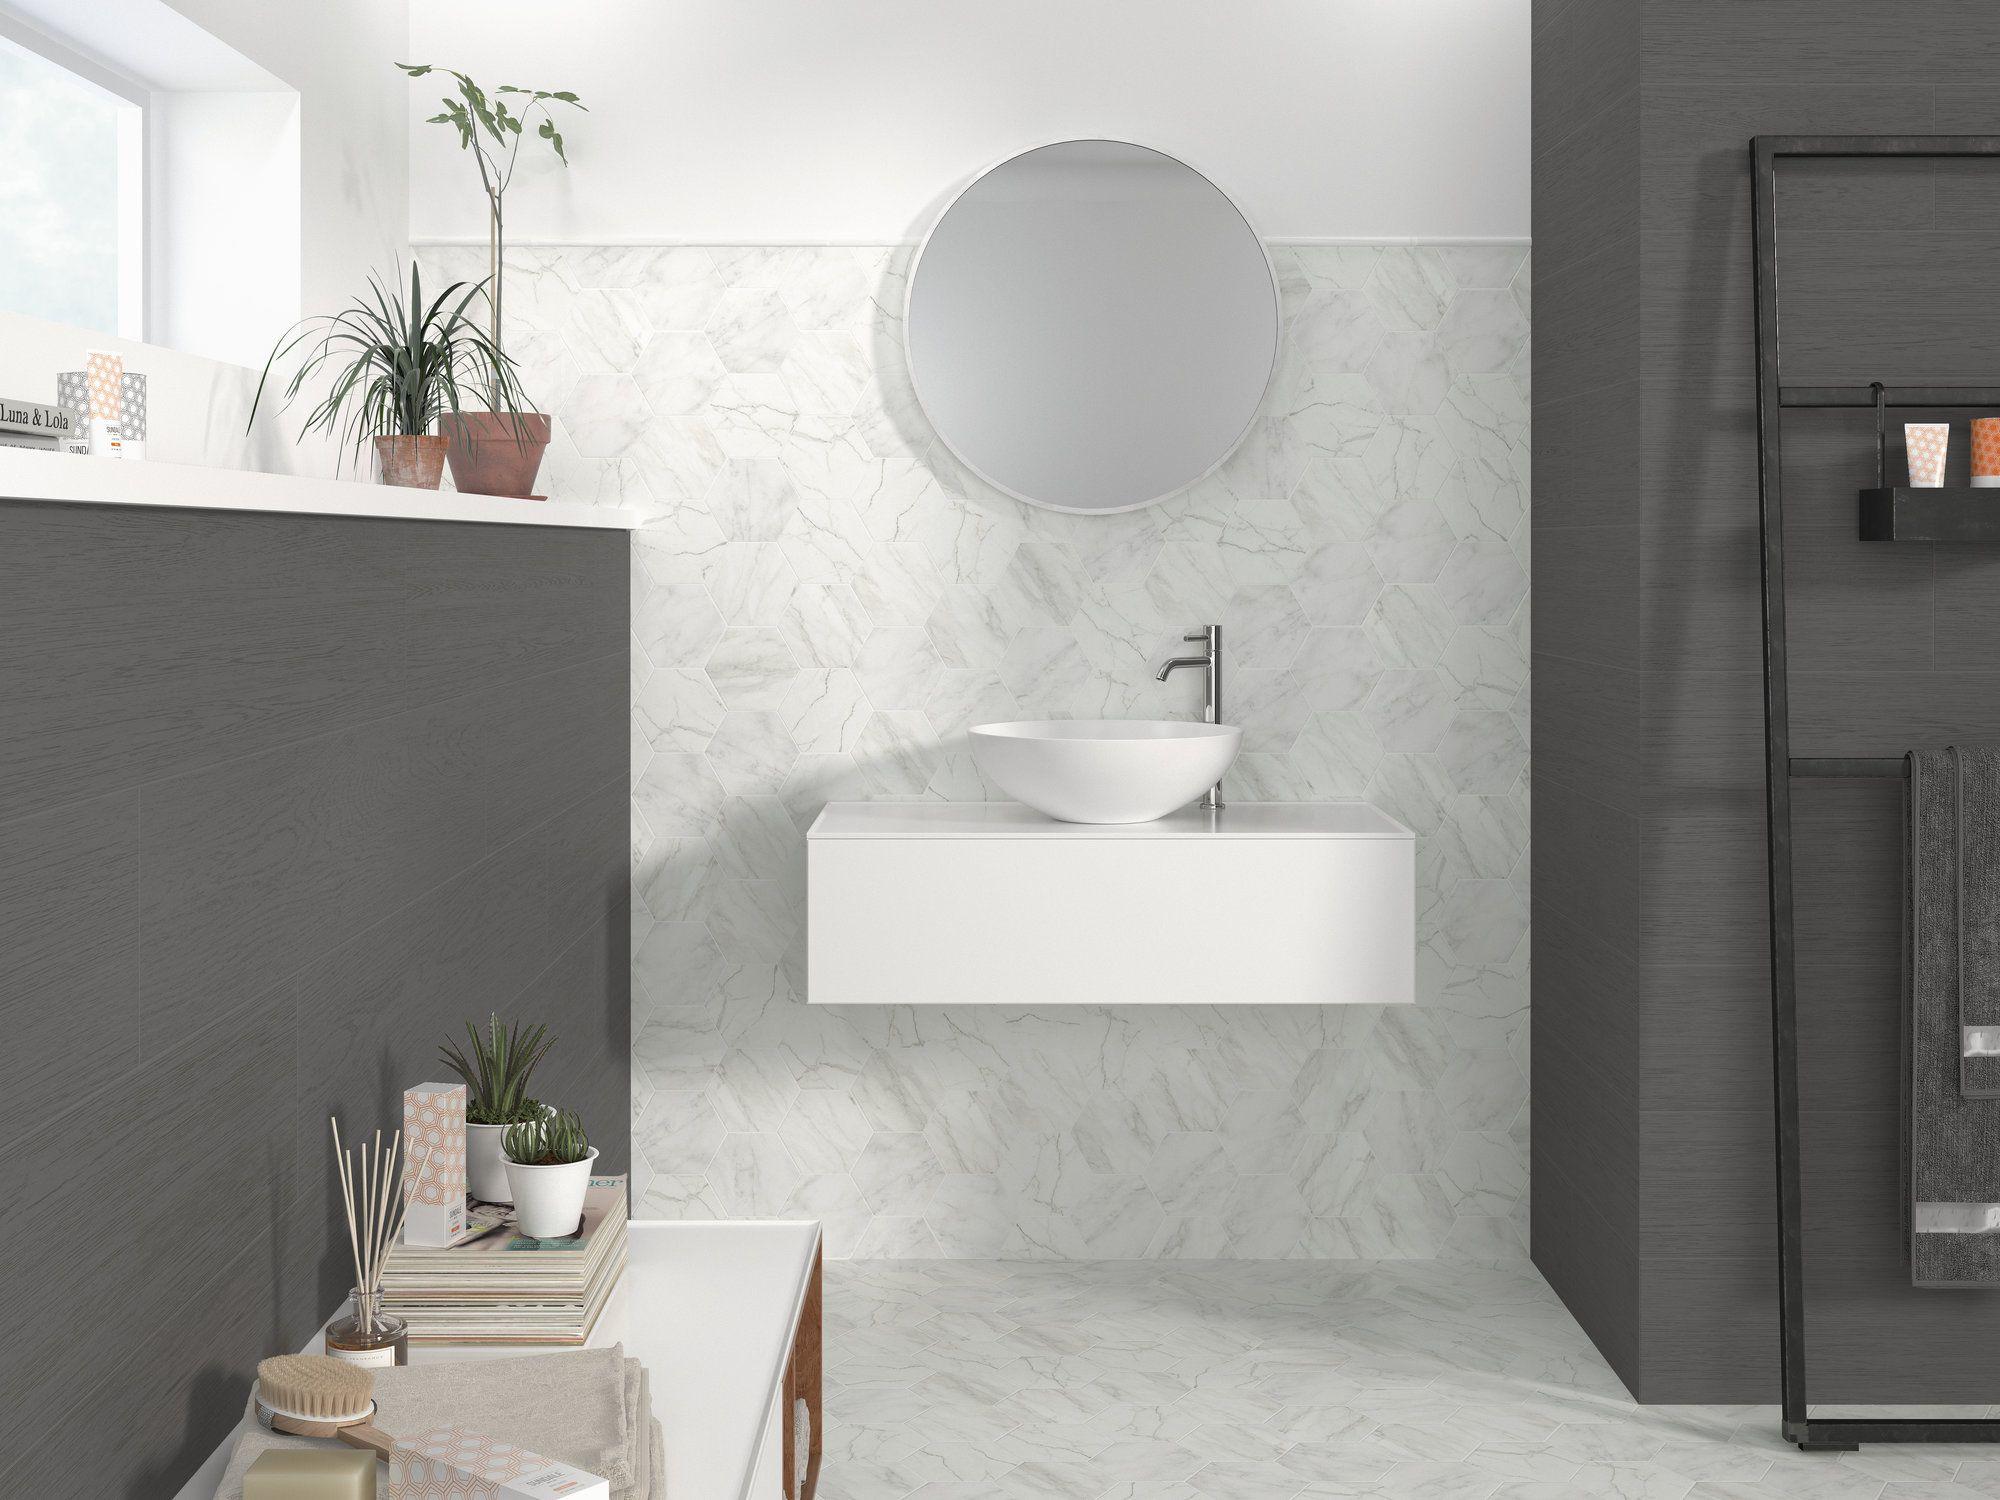 Ape Verona 5x6 Hexagon In White Carrara Look Suitable For Floors And Walls White Bathroom Tiles White Bathroom Tiles Price